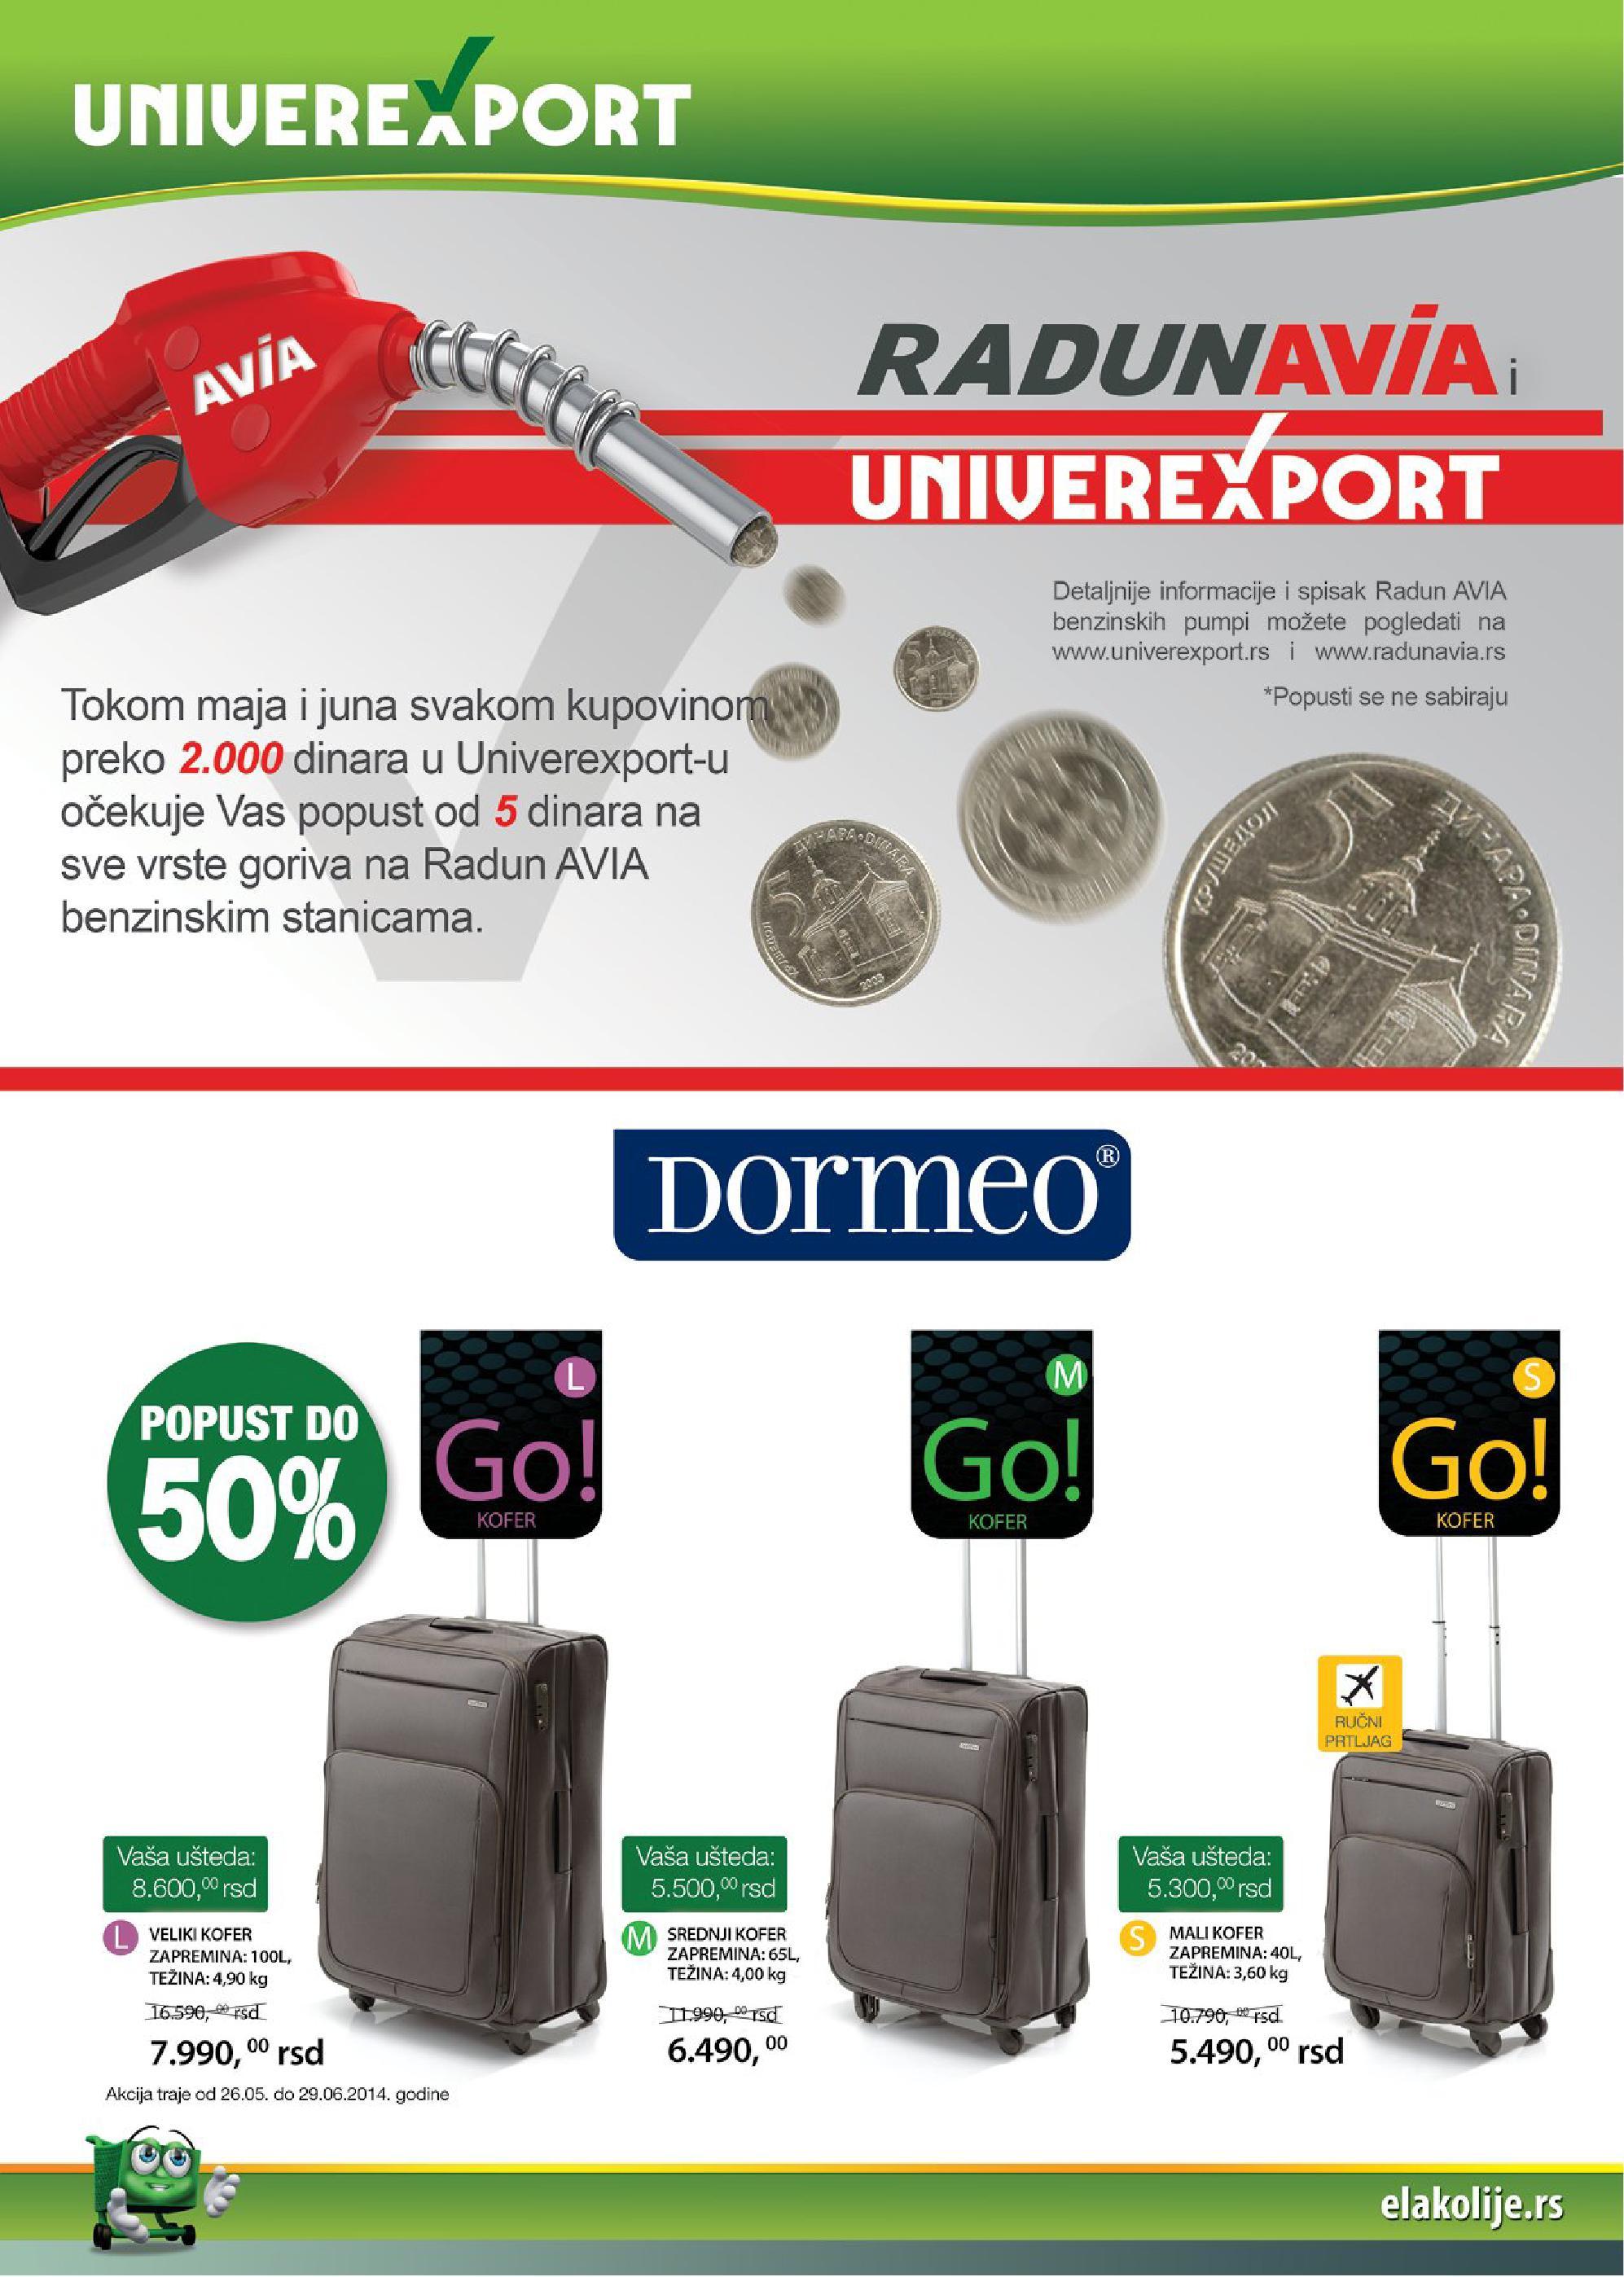 Univerexport akcija sjanih cena za vas